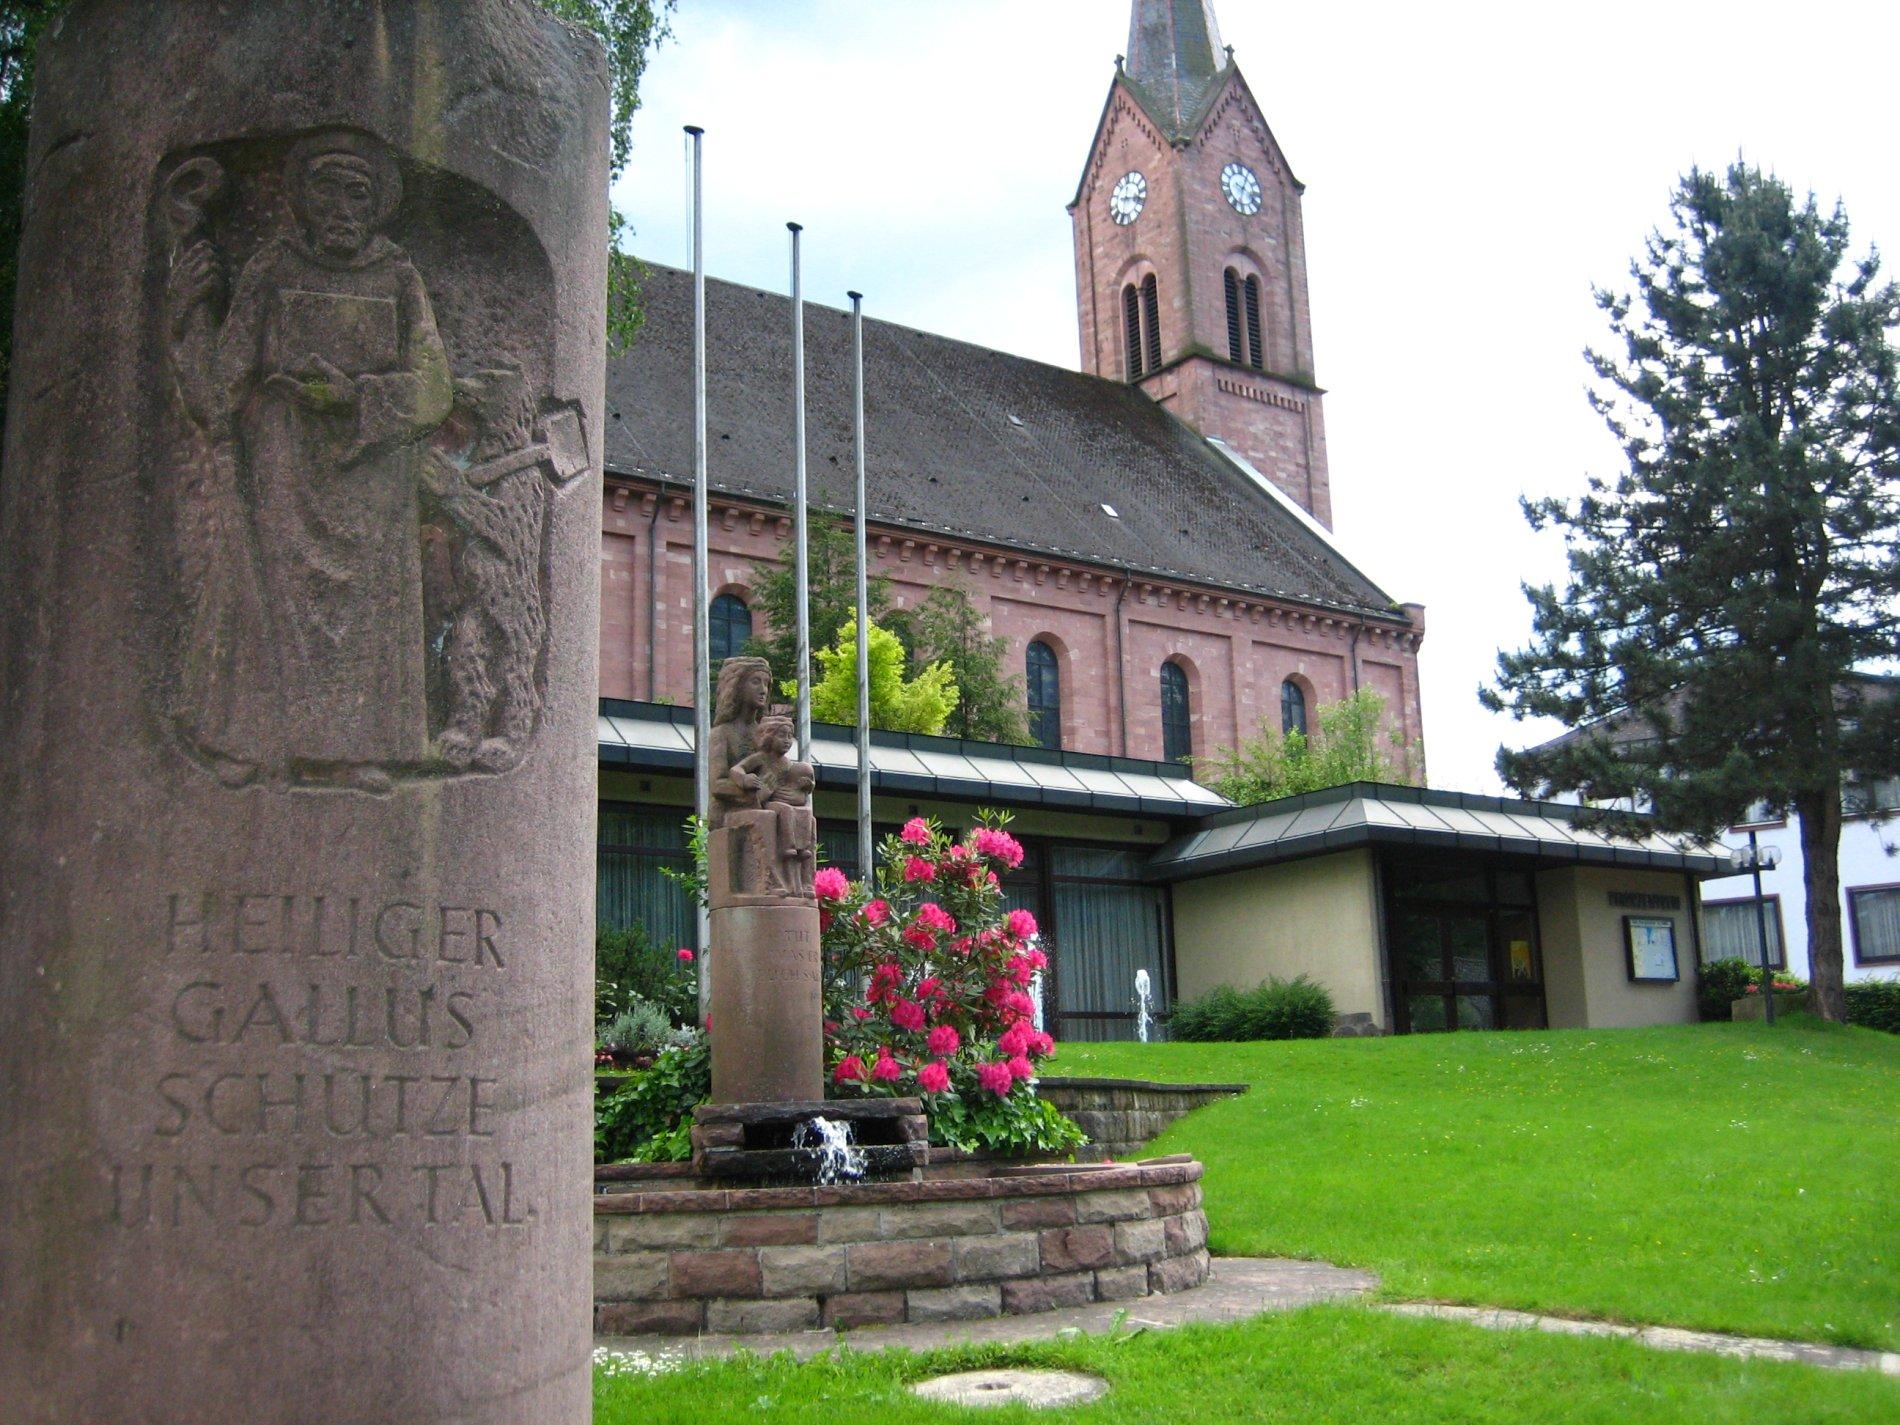 Pfarrkirche St. Gallus Oberharmersbach / Urheber: Gemeinde Oberharmersbach